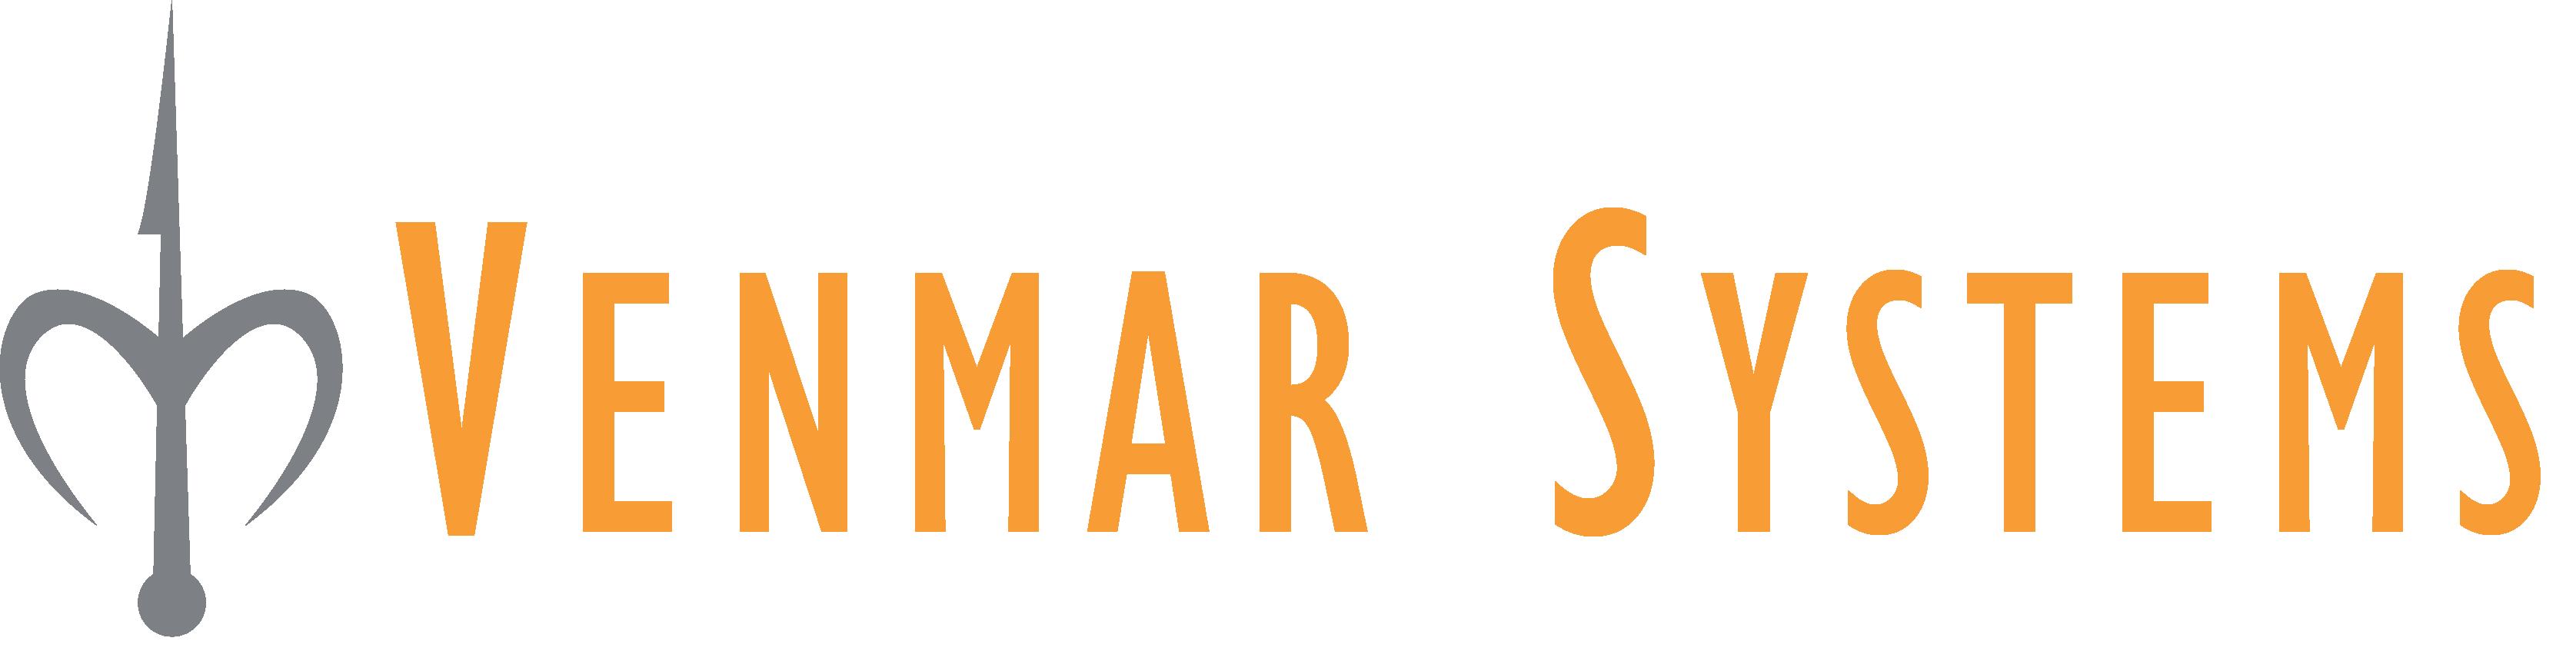 Venmar Systems, Inc.